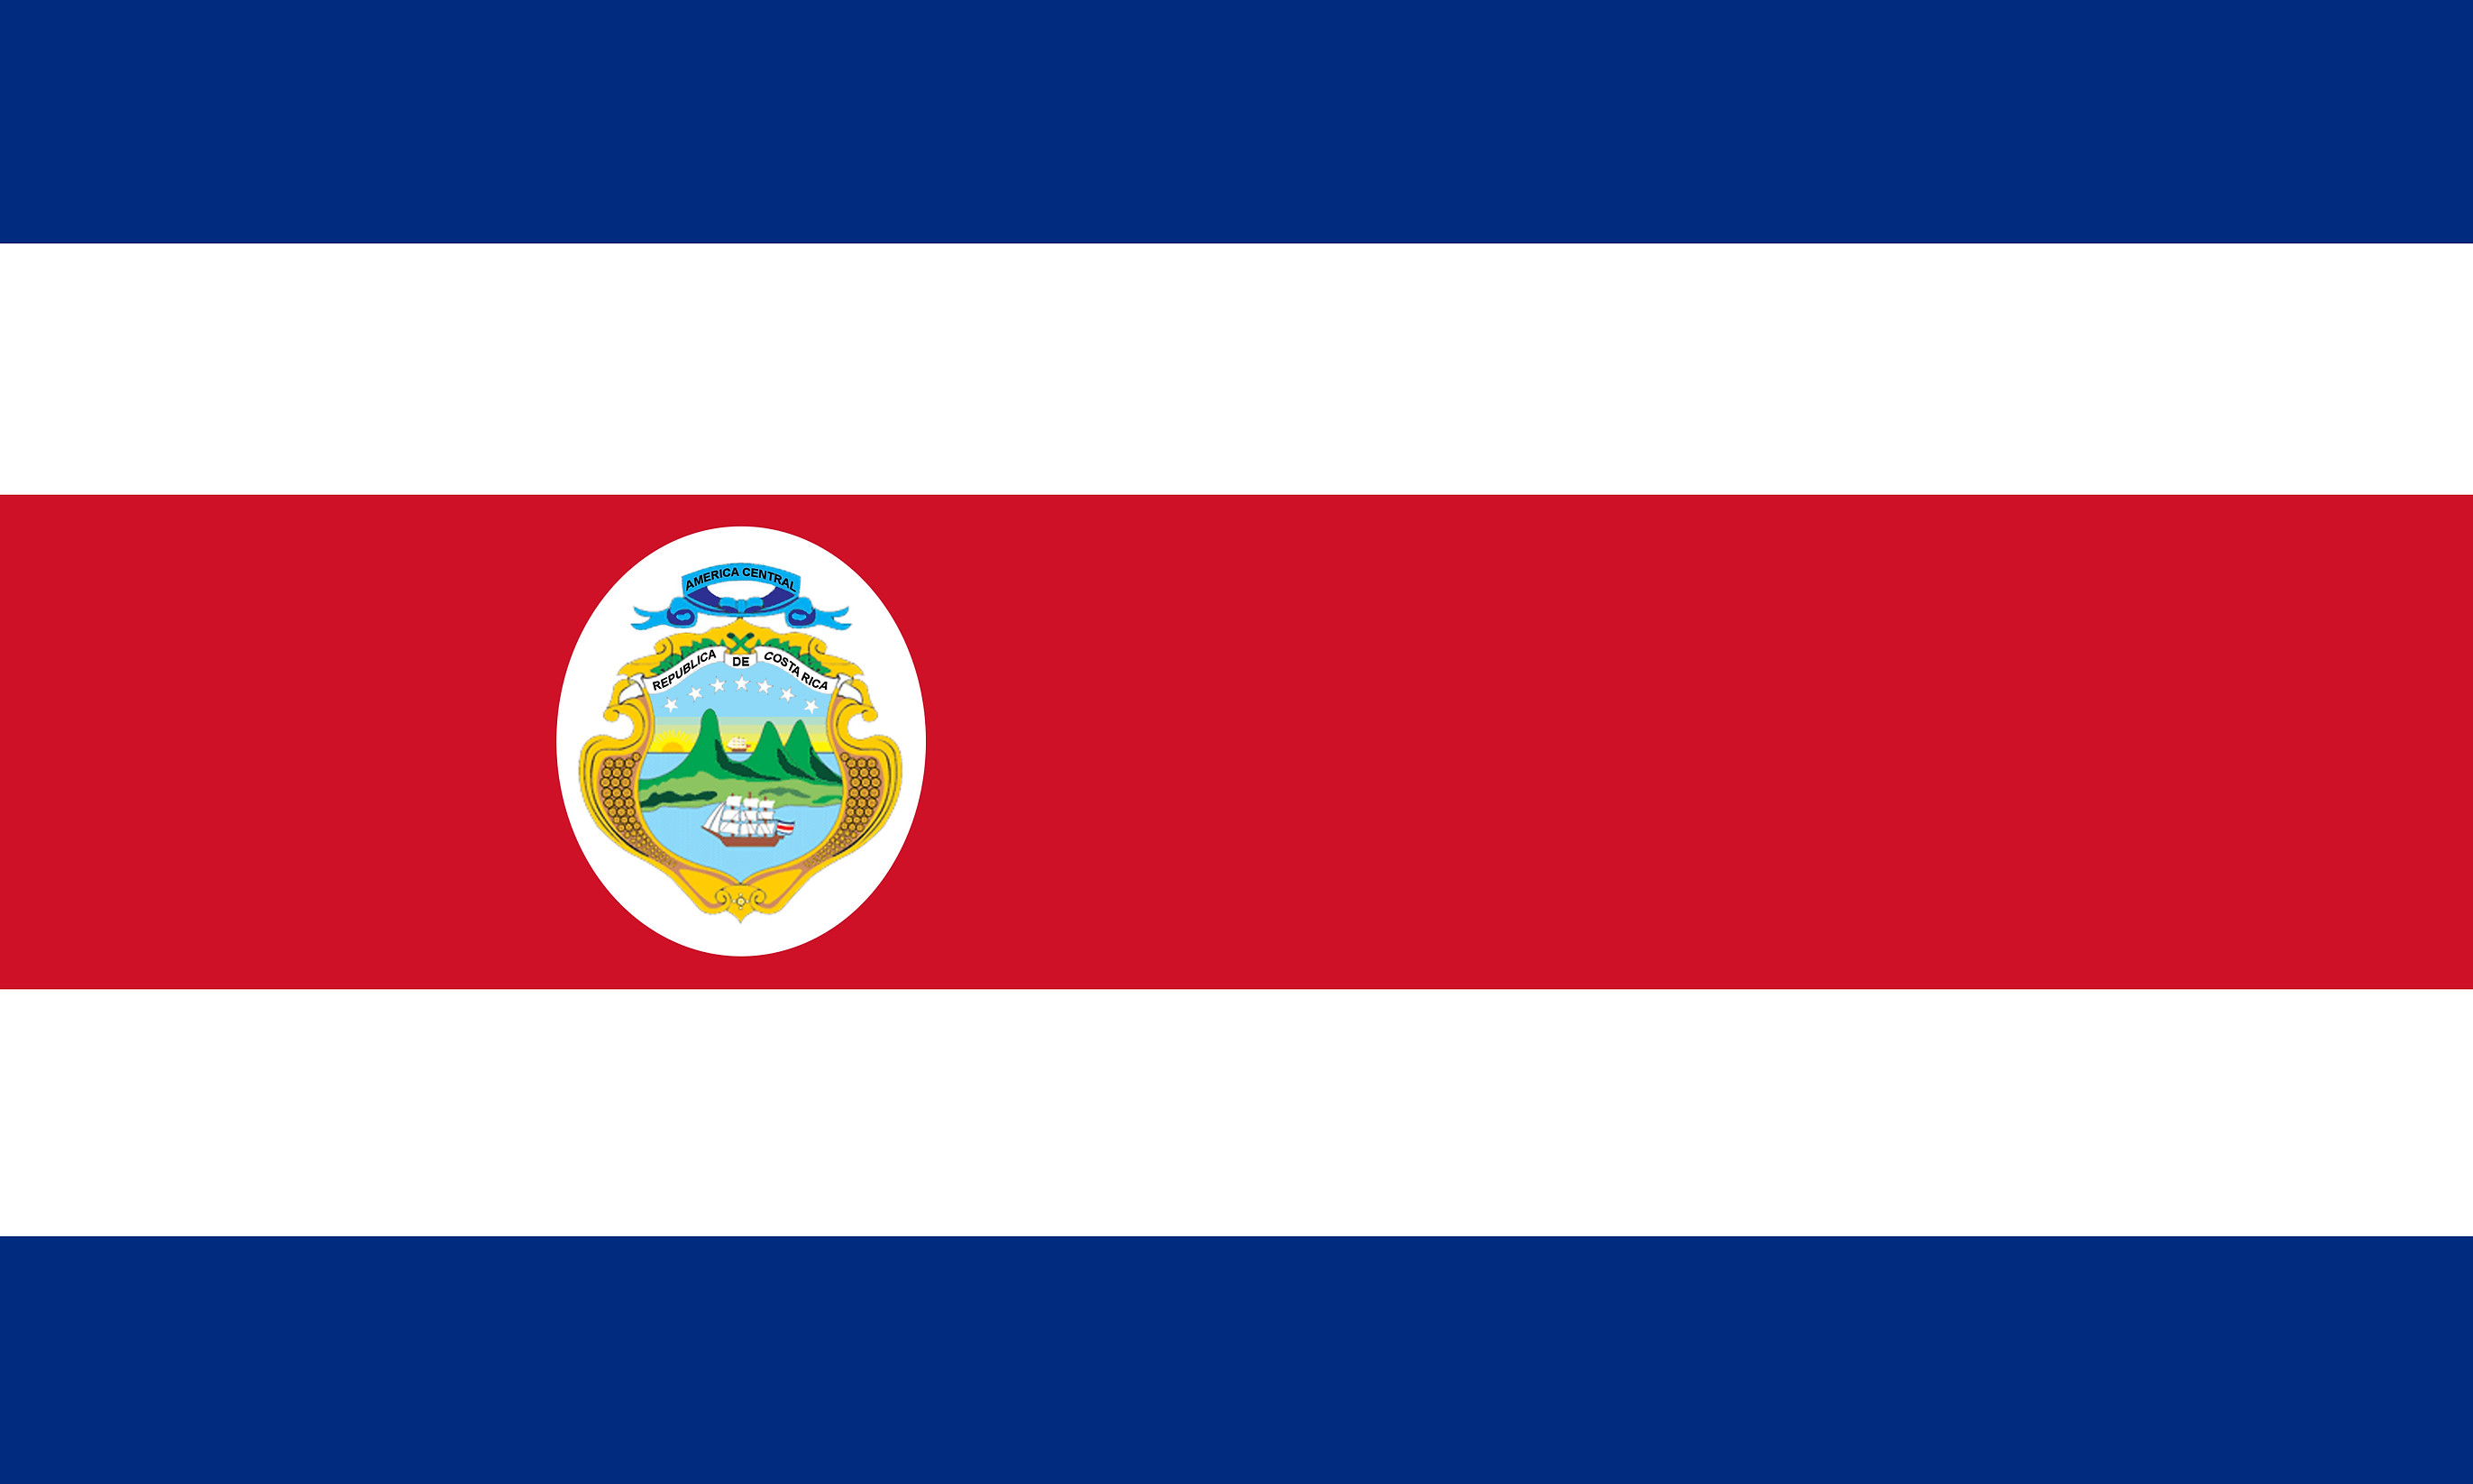 bigstock-Flag-of-Costa-Rica-with-Coat-o-